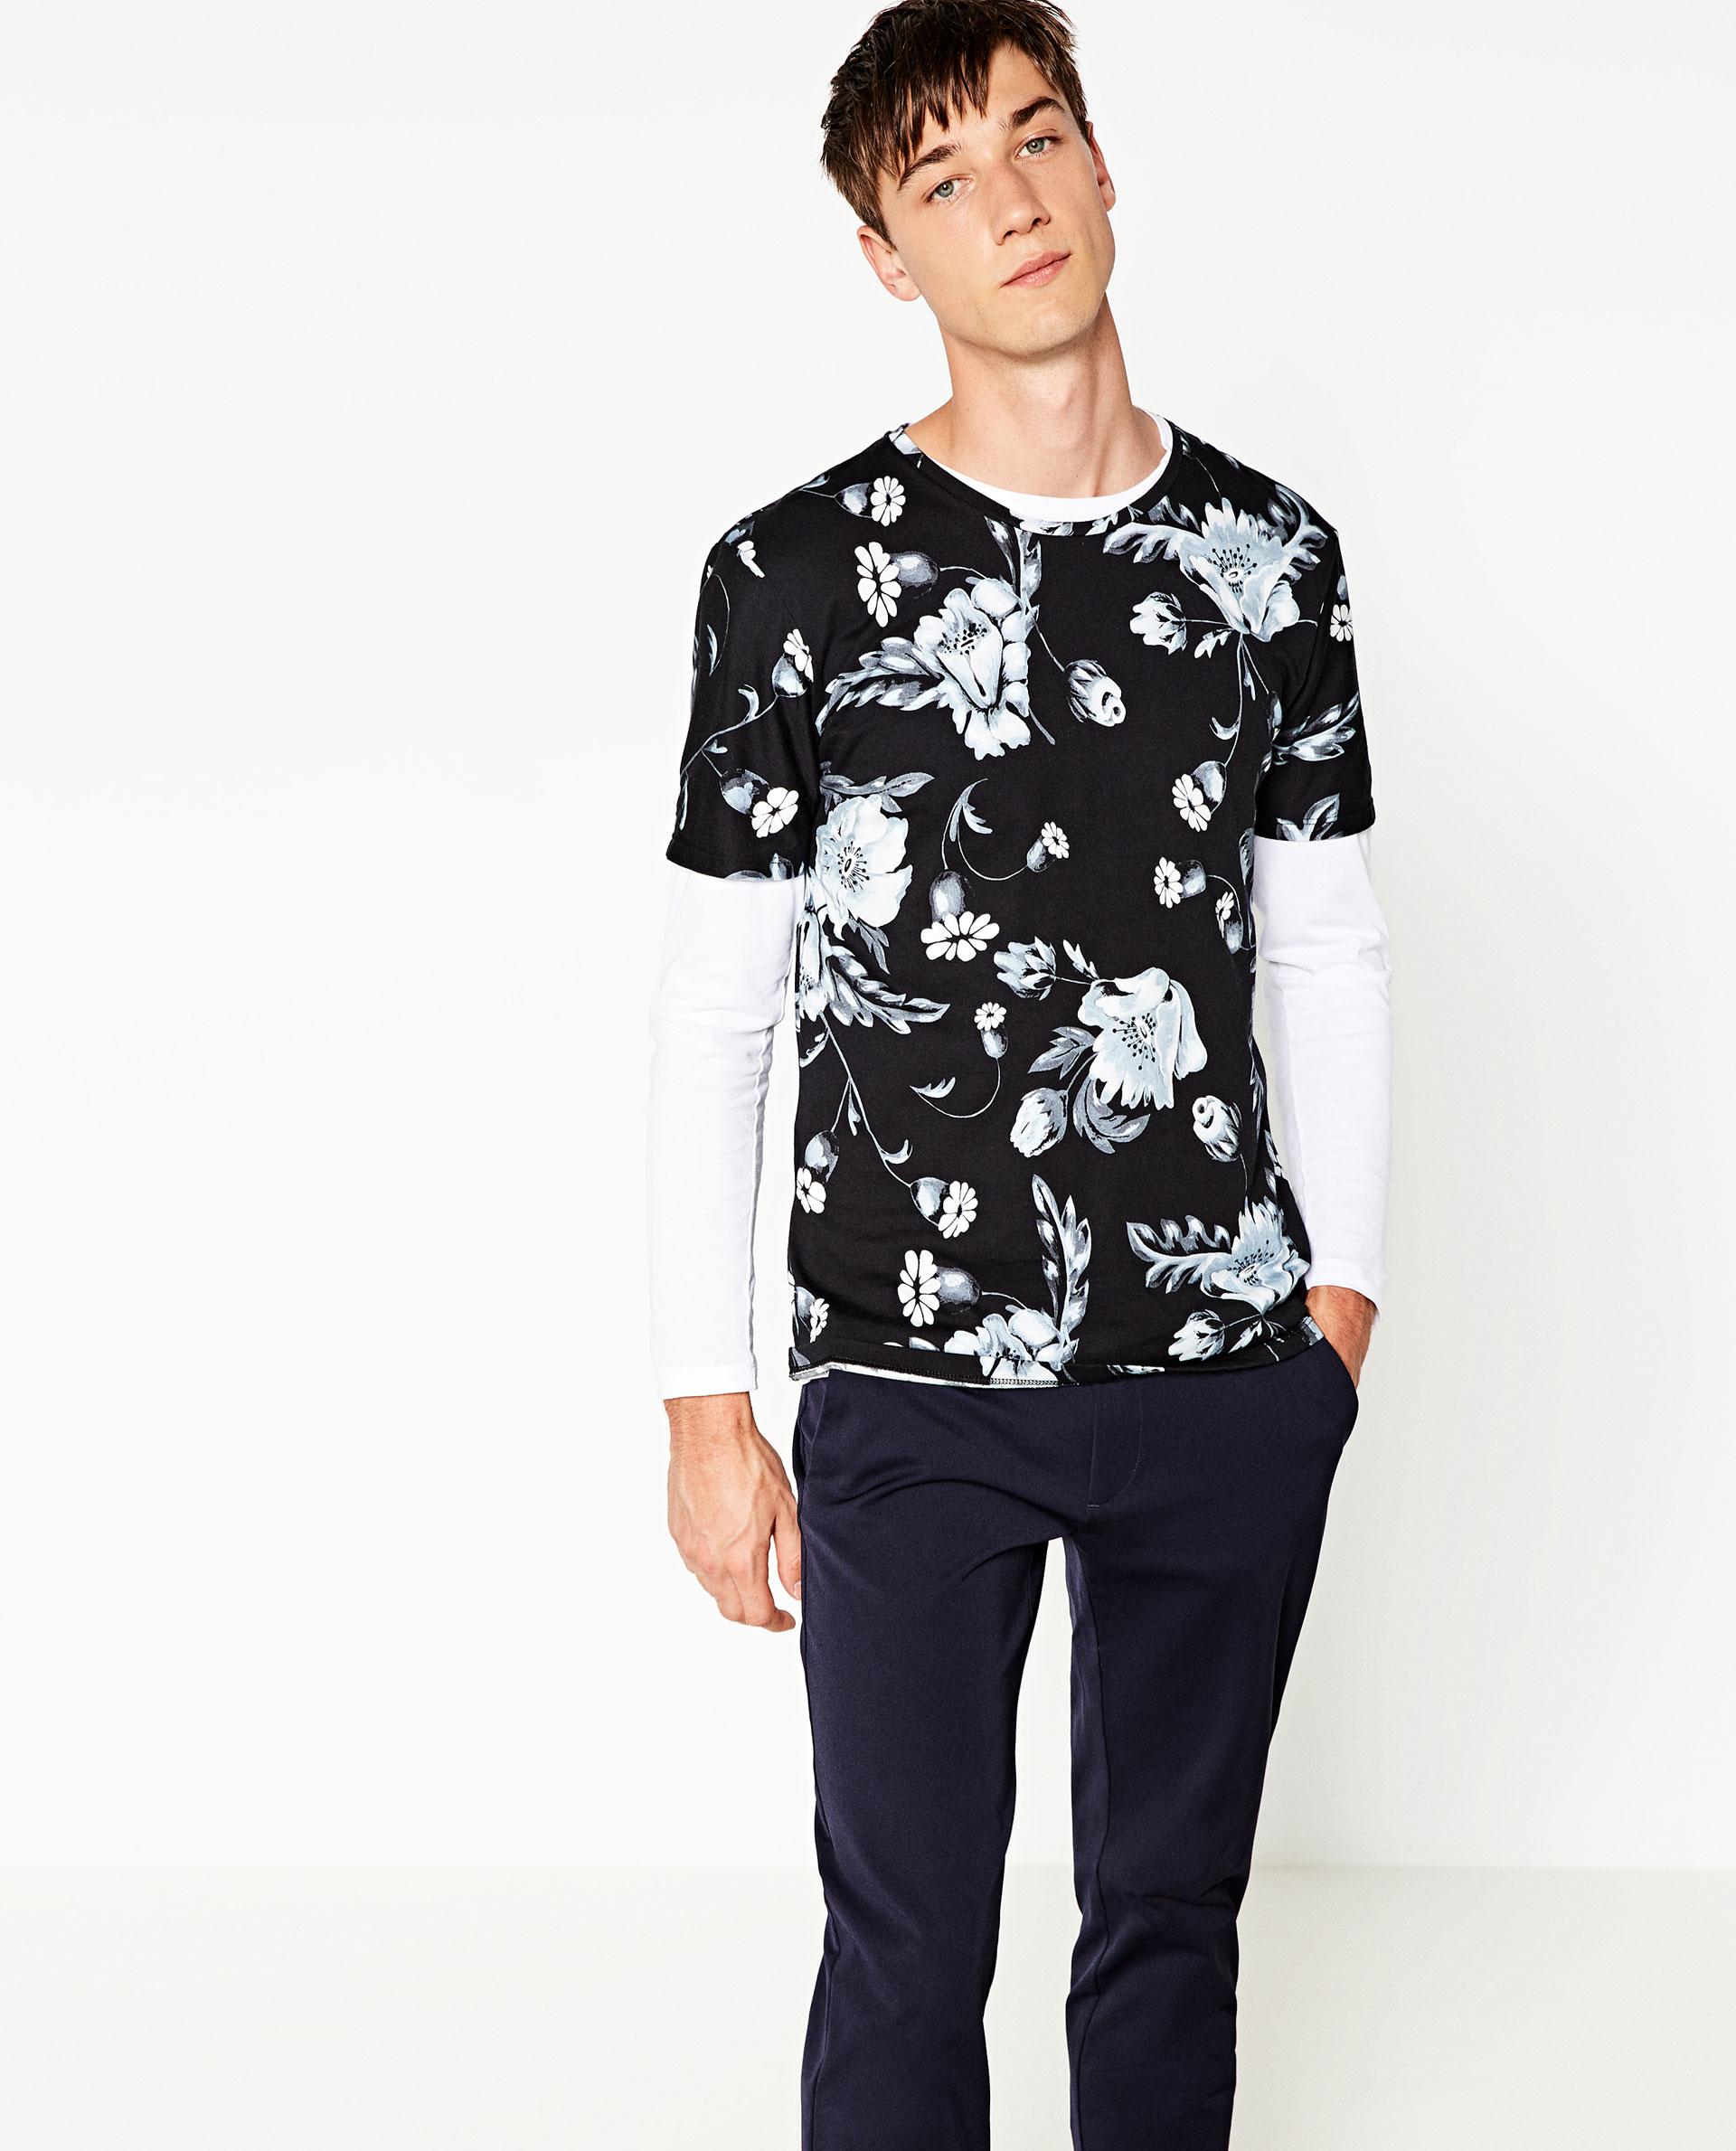 Zara retro floral t shirt in blue for men lyst for Zara mens floral shirt